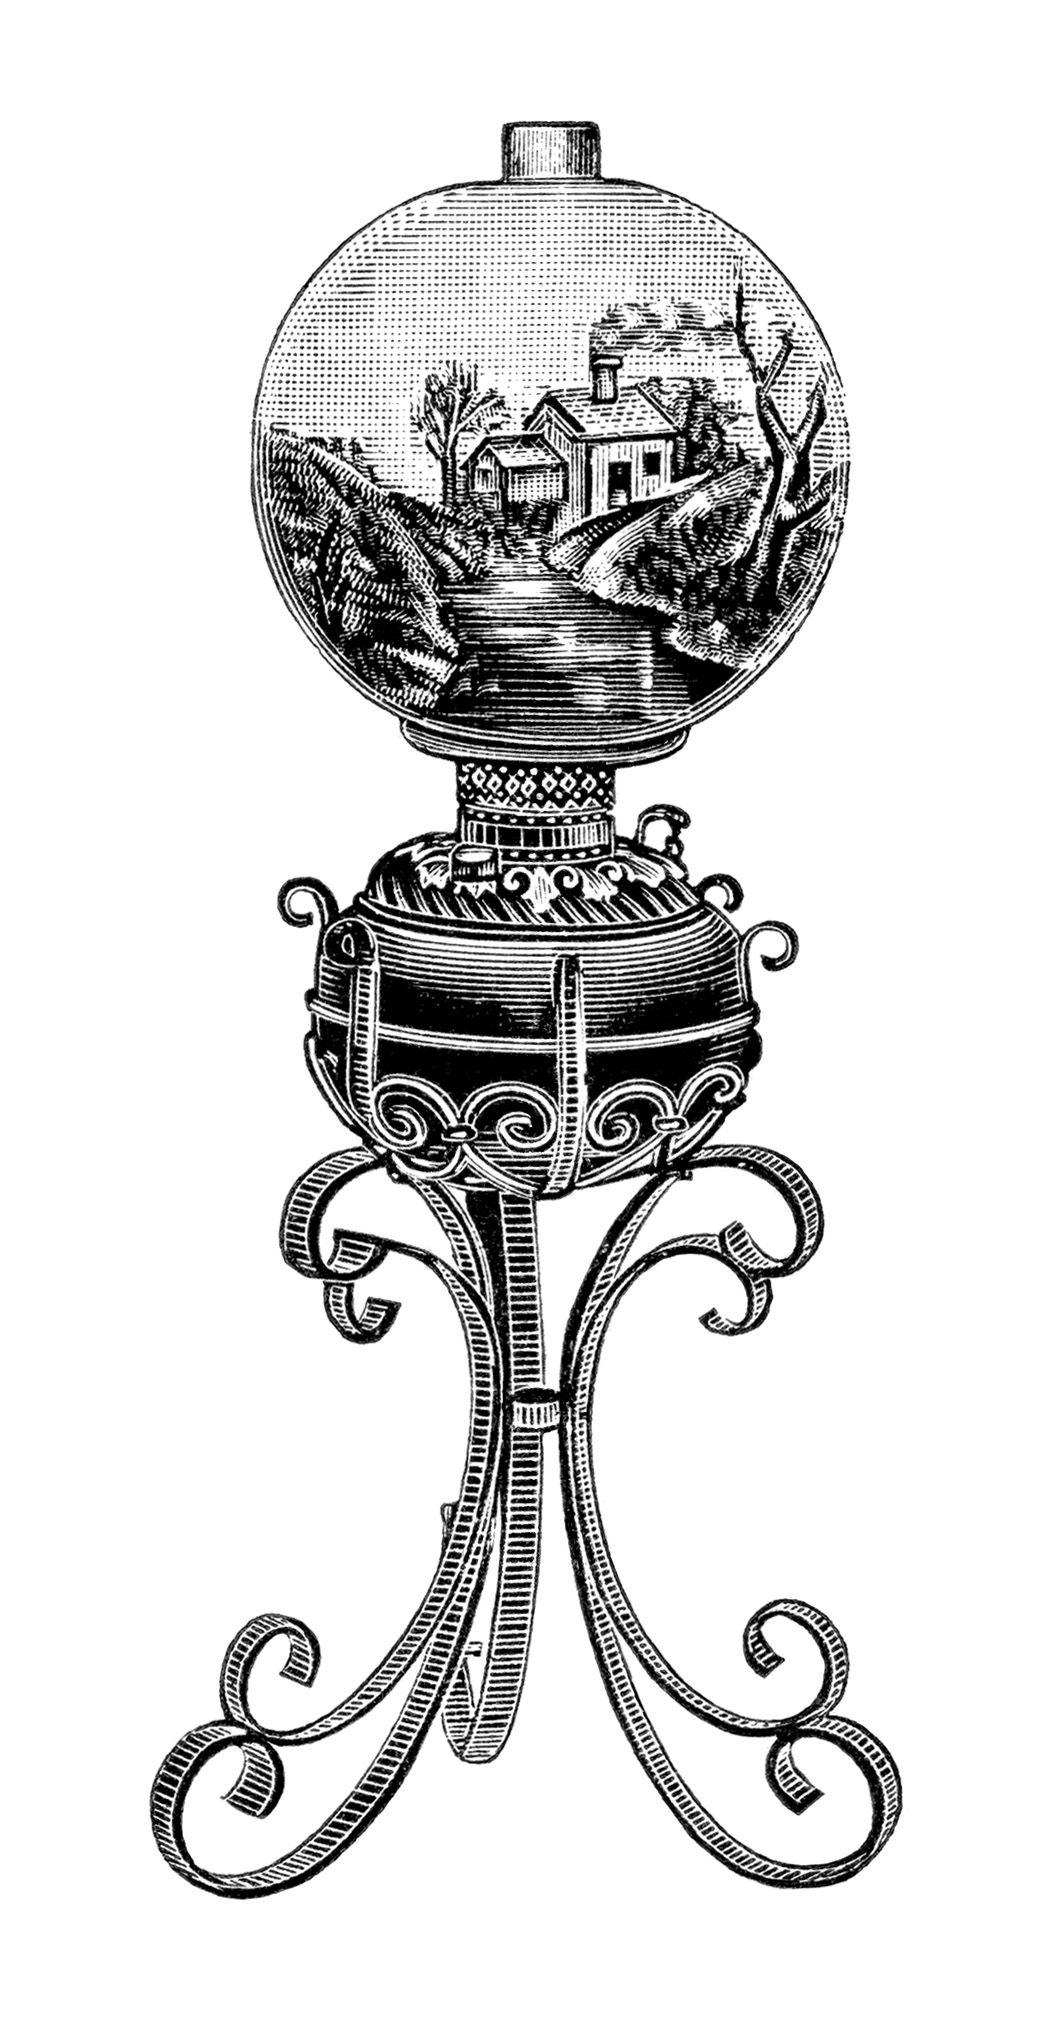 lamp clipart black and white. explore clipart black and white, victorian lamps, more! lamp white